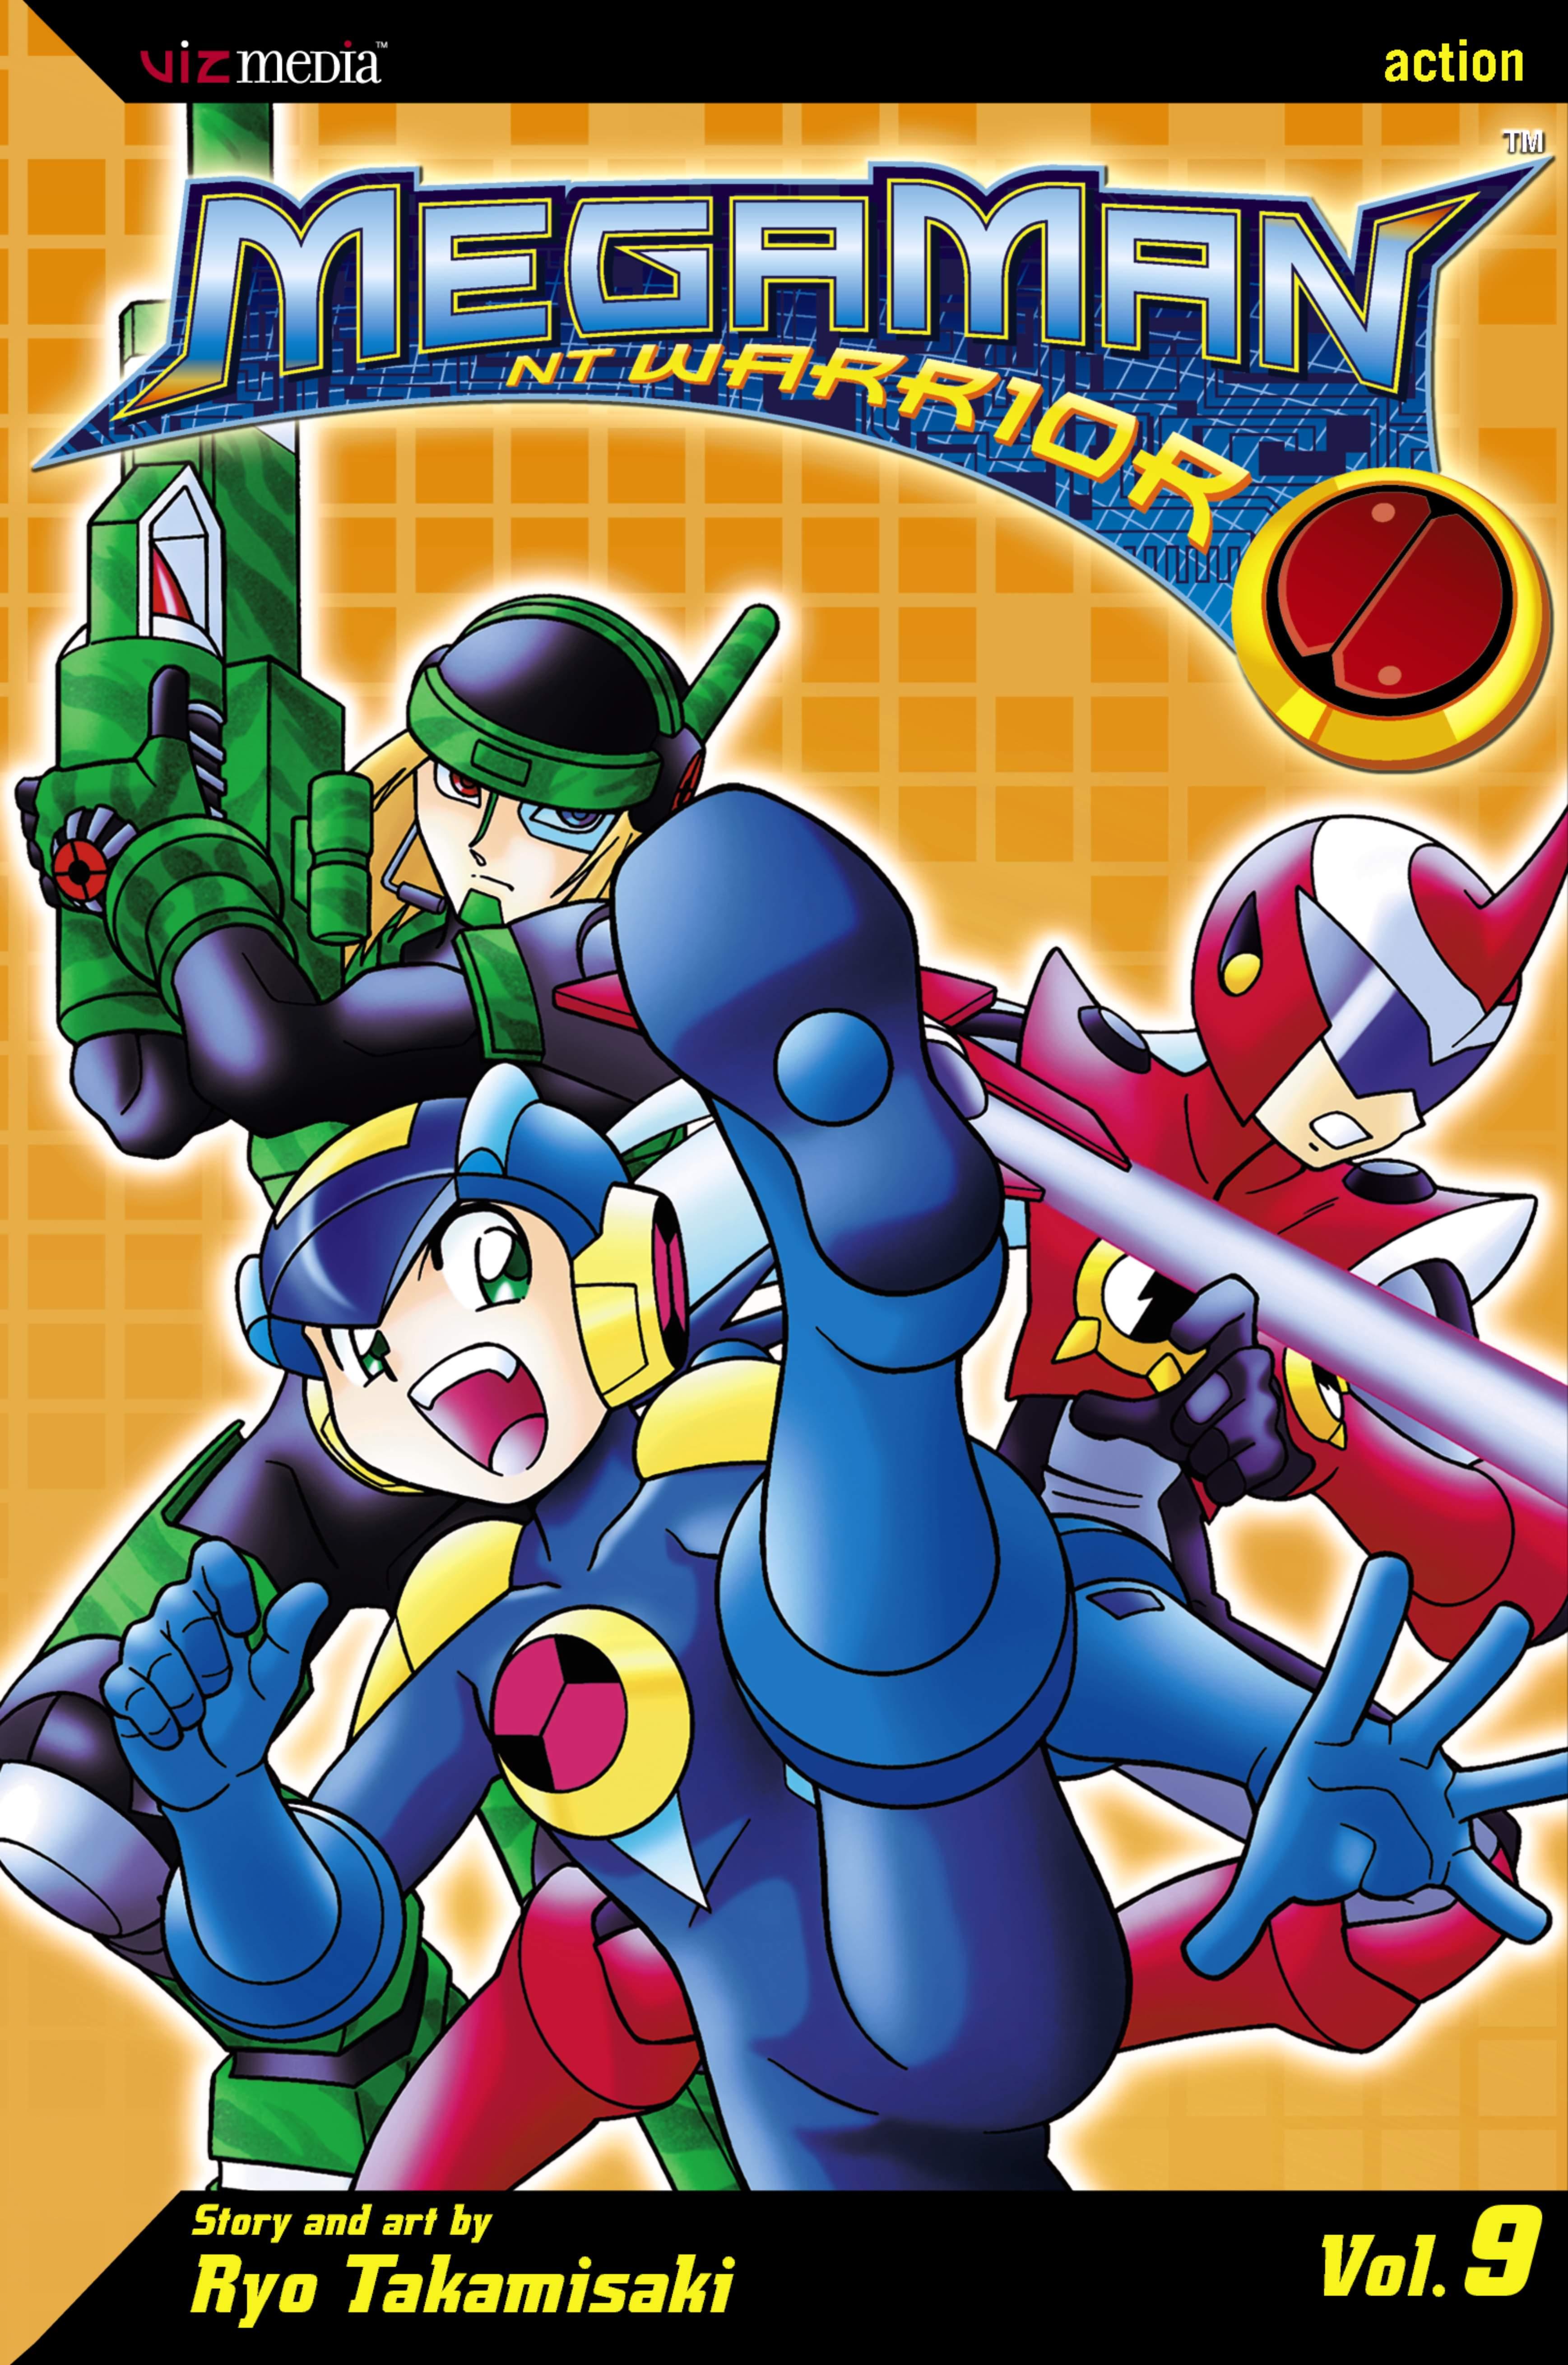 megaman nt warrior vol 9 book by ryo takamisaki official